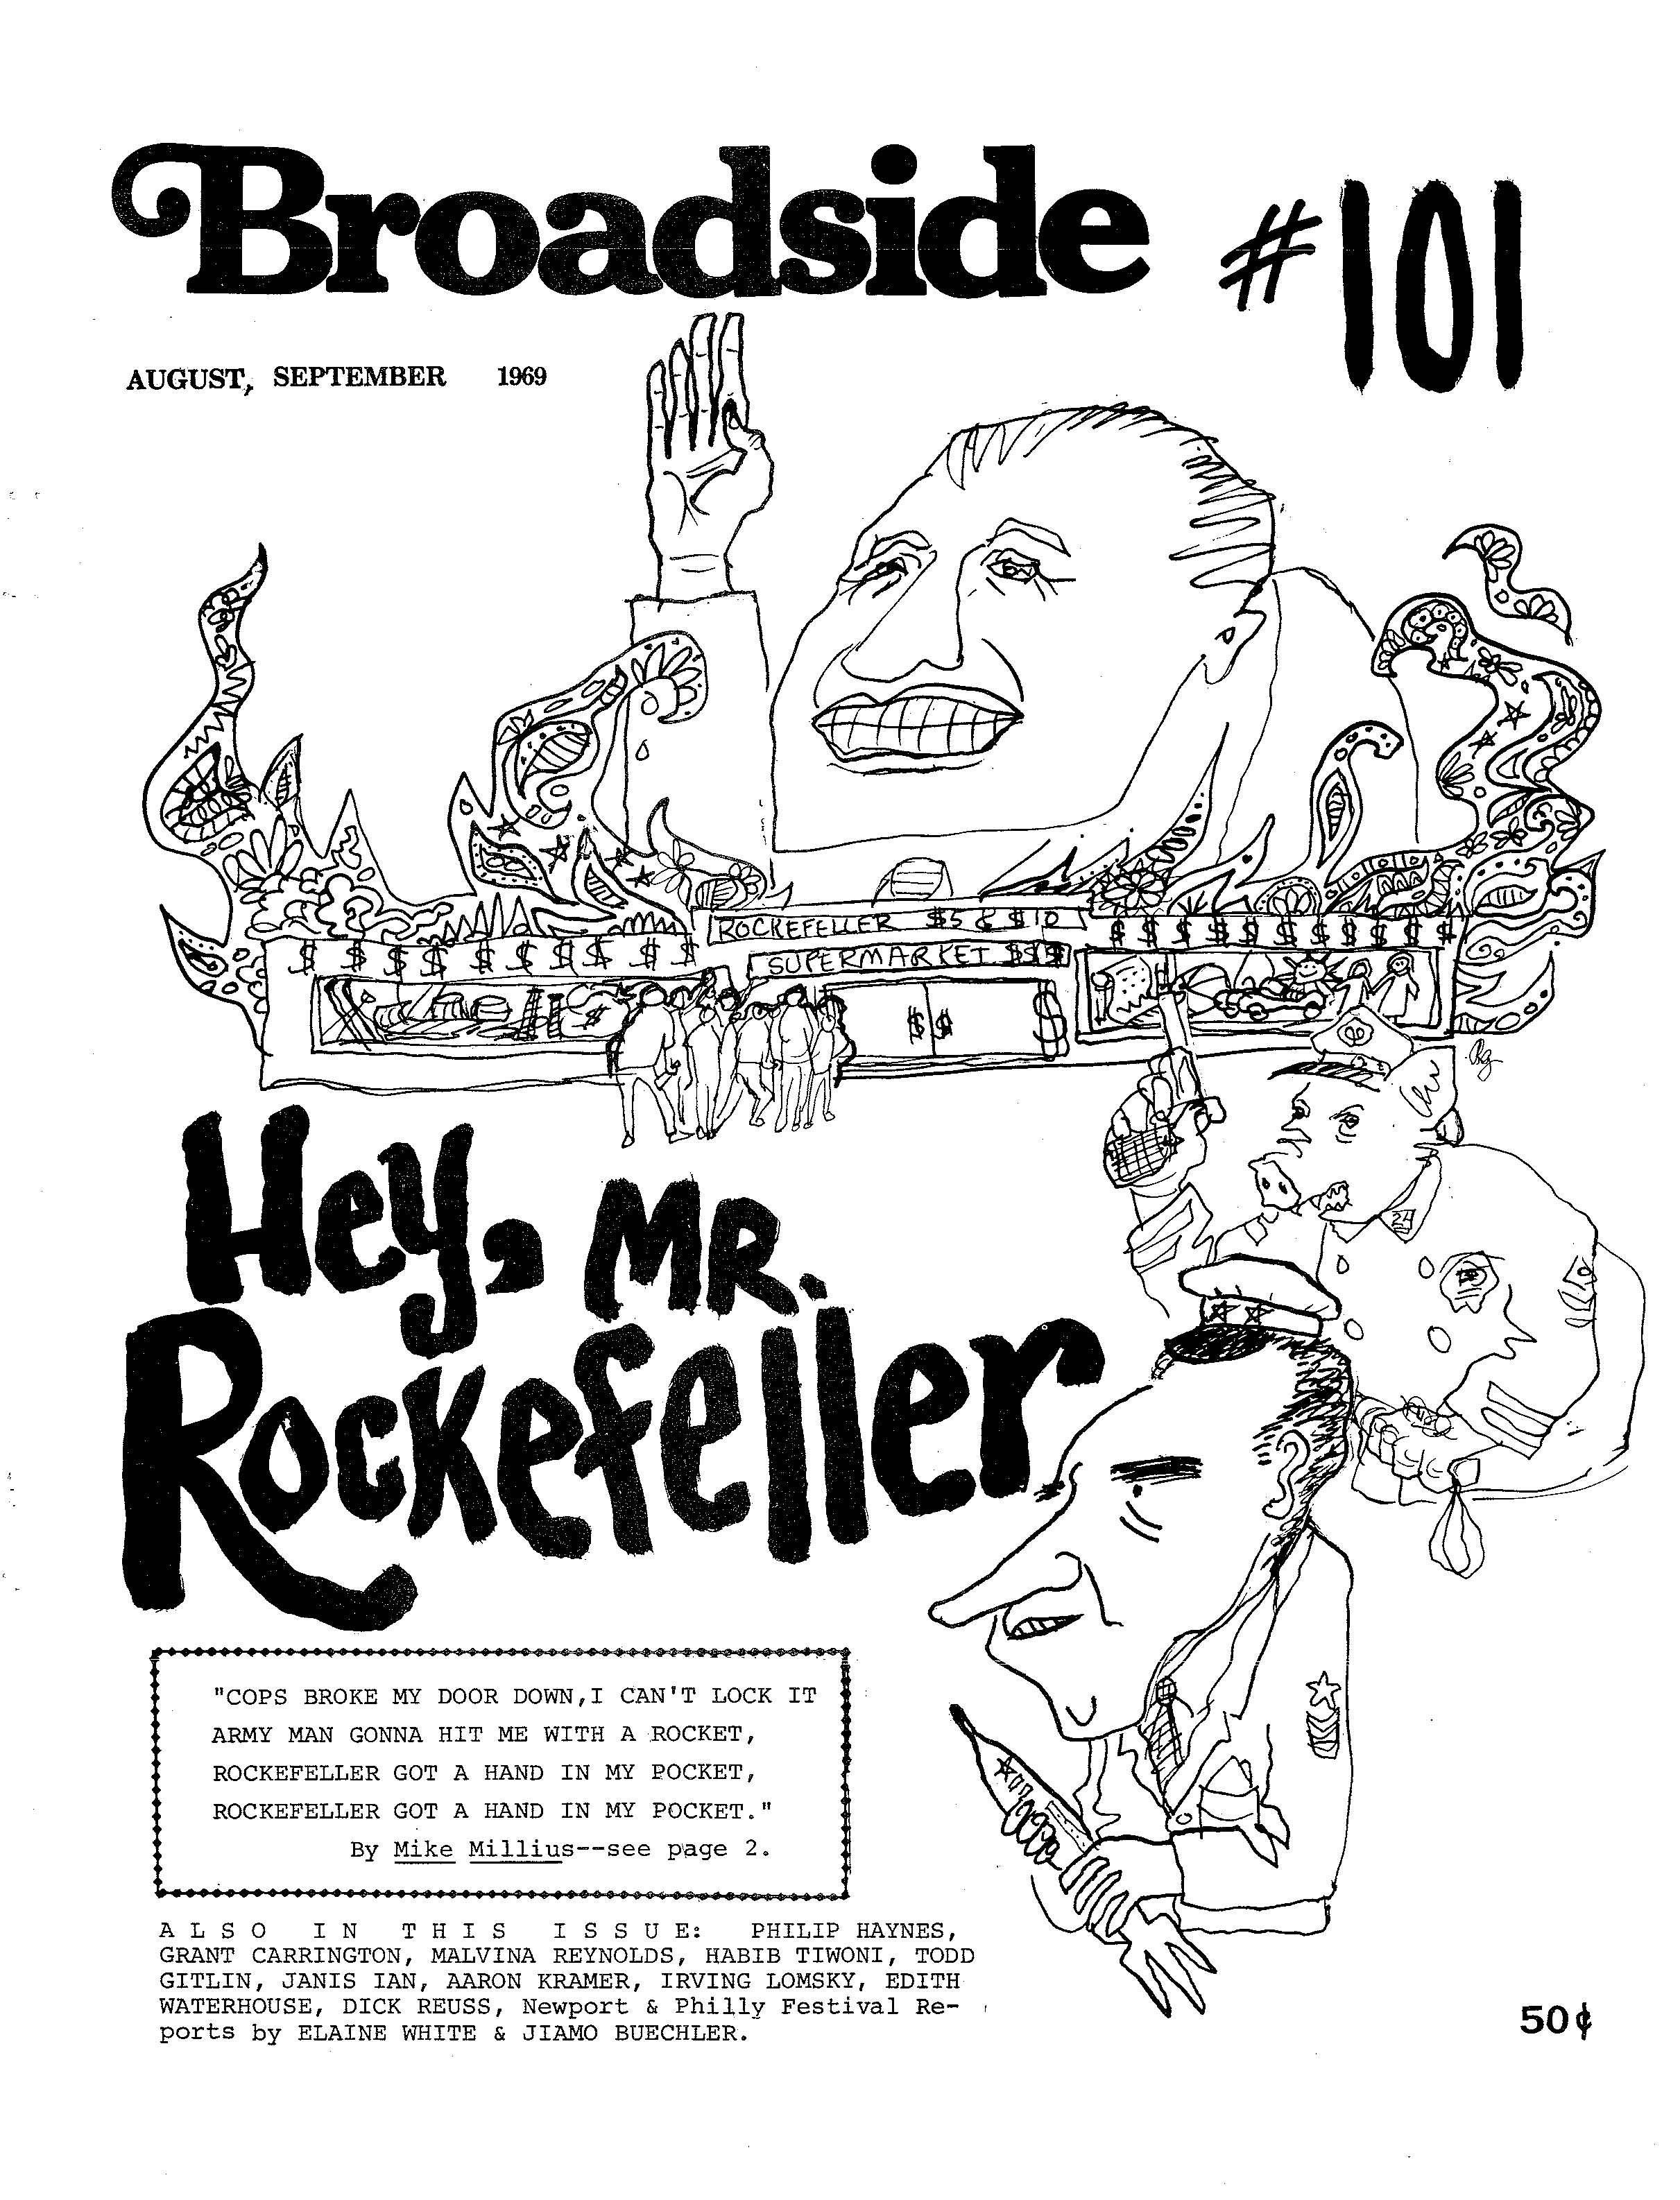 Broadside #101